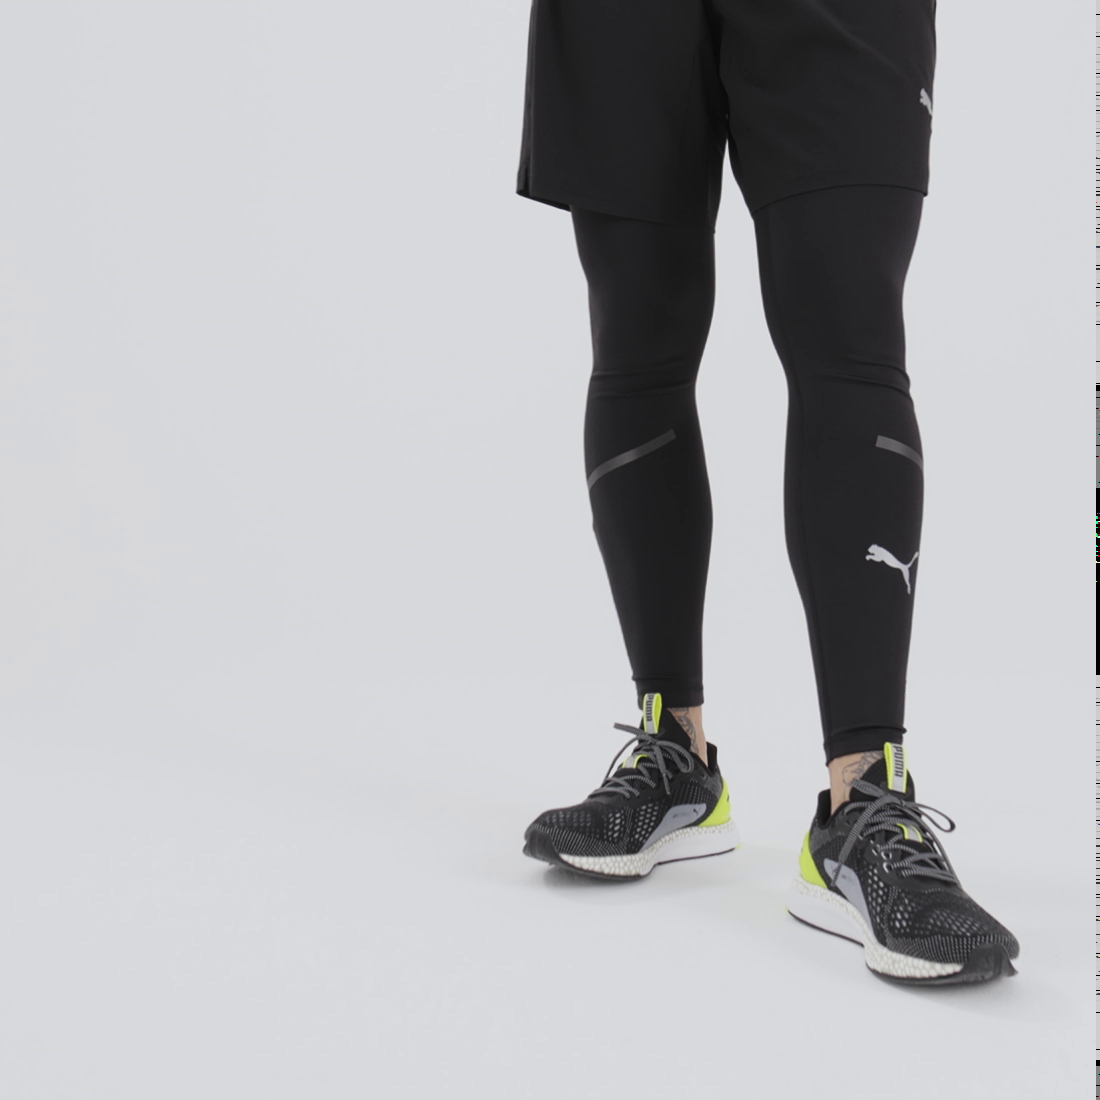 Görüntü Puma Runner ID Thermo R+ Koşu Erkek Tayt #8